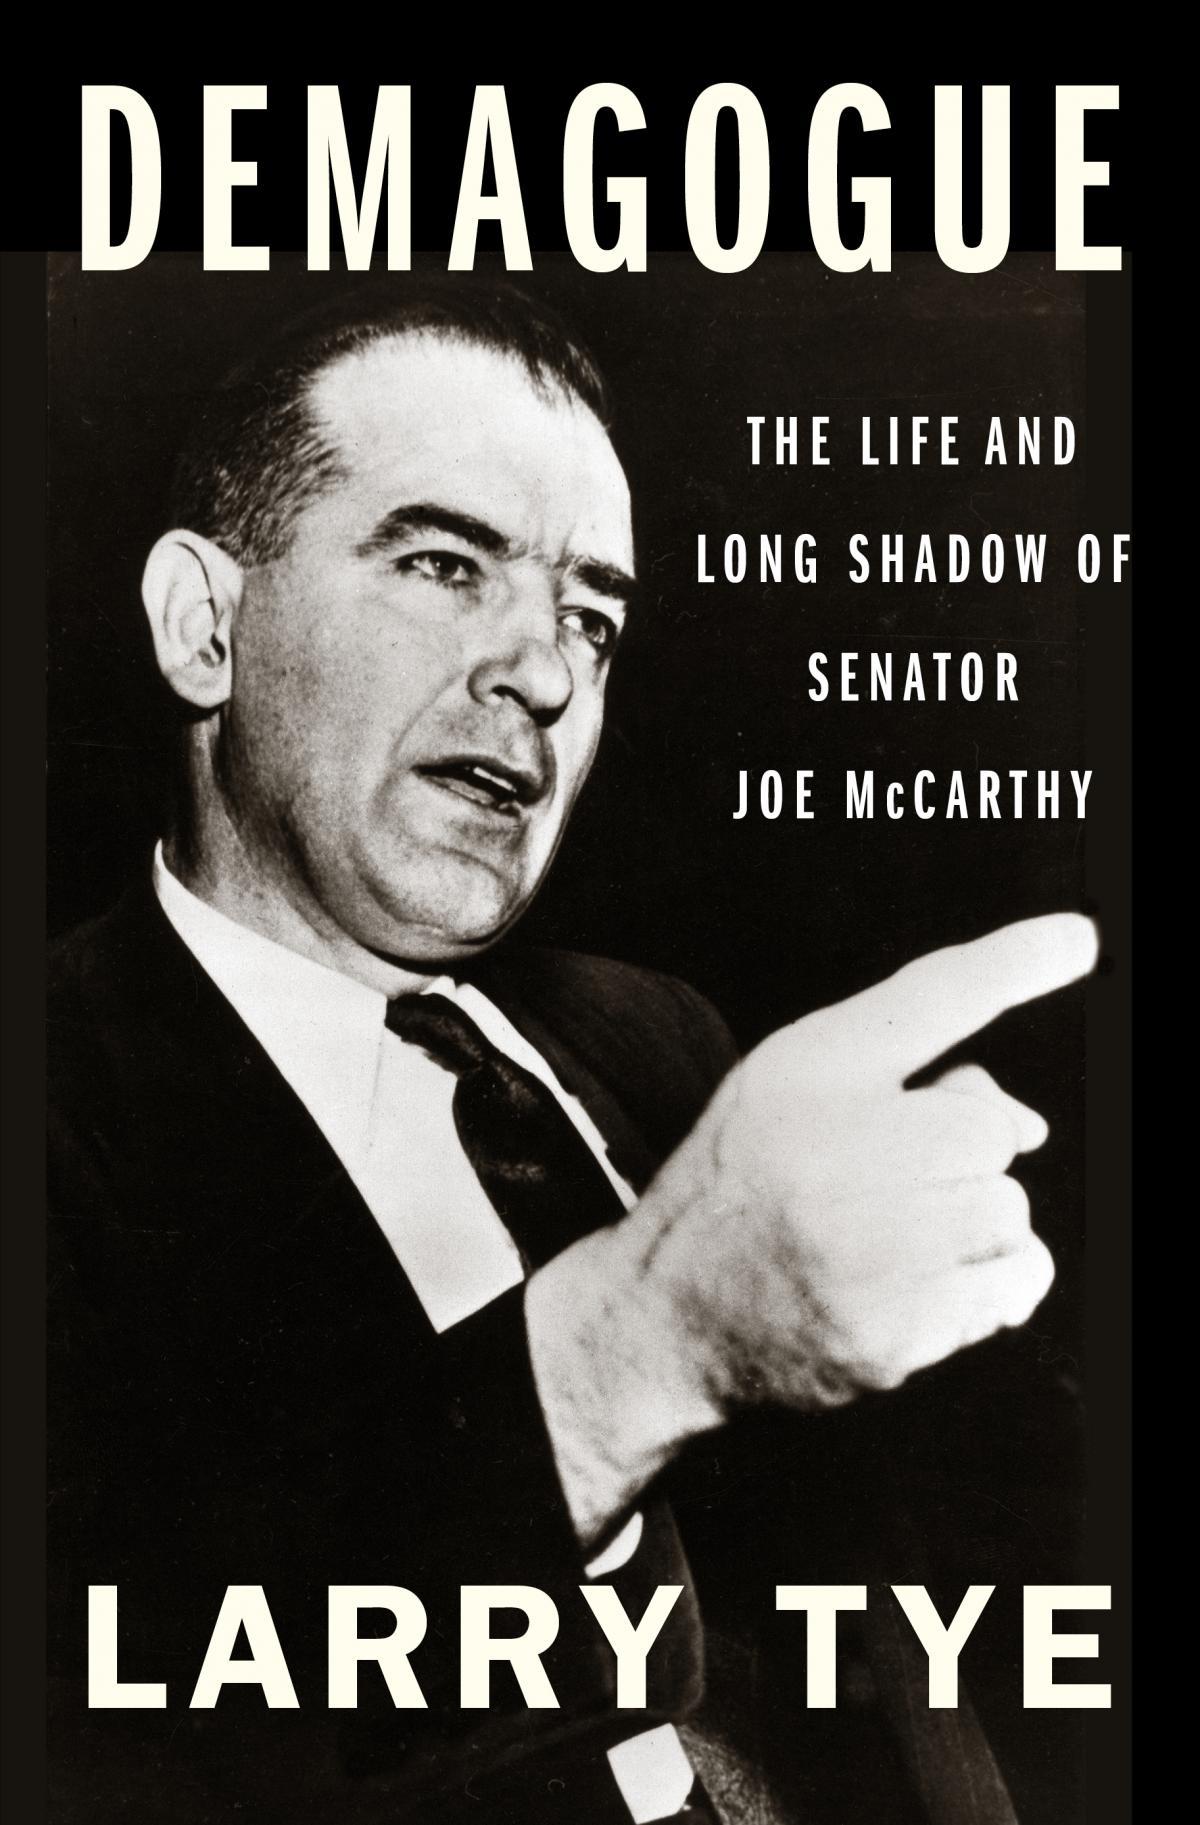 Demagogue: The Life and Long Shadow of Senator Joe McCarthy, by Larry Tye